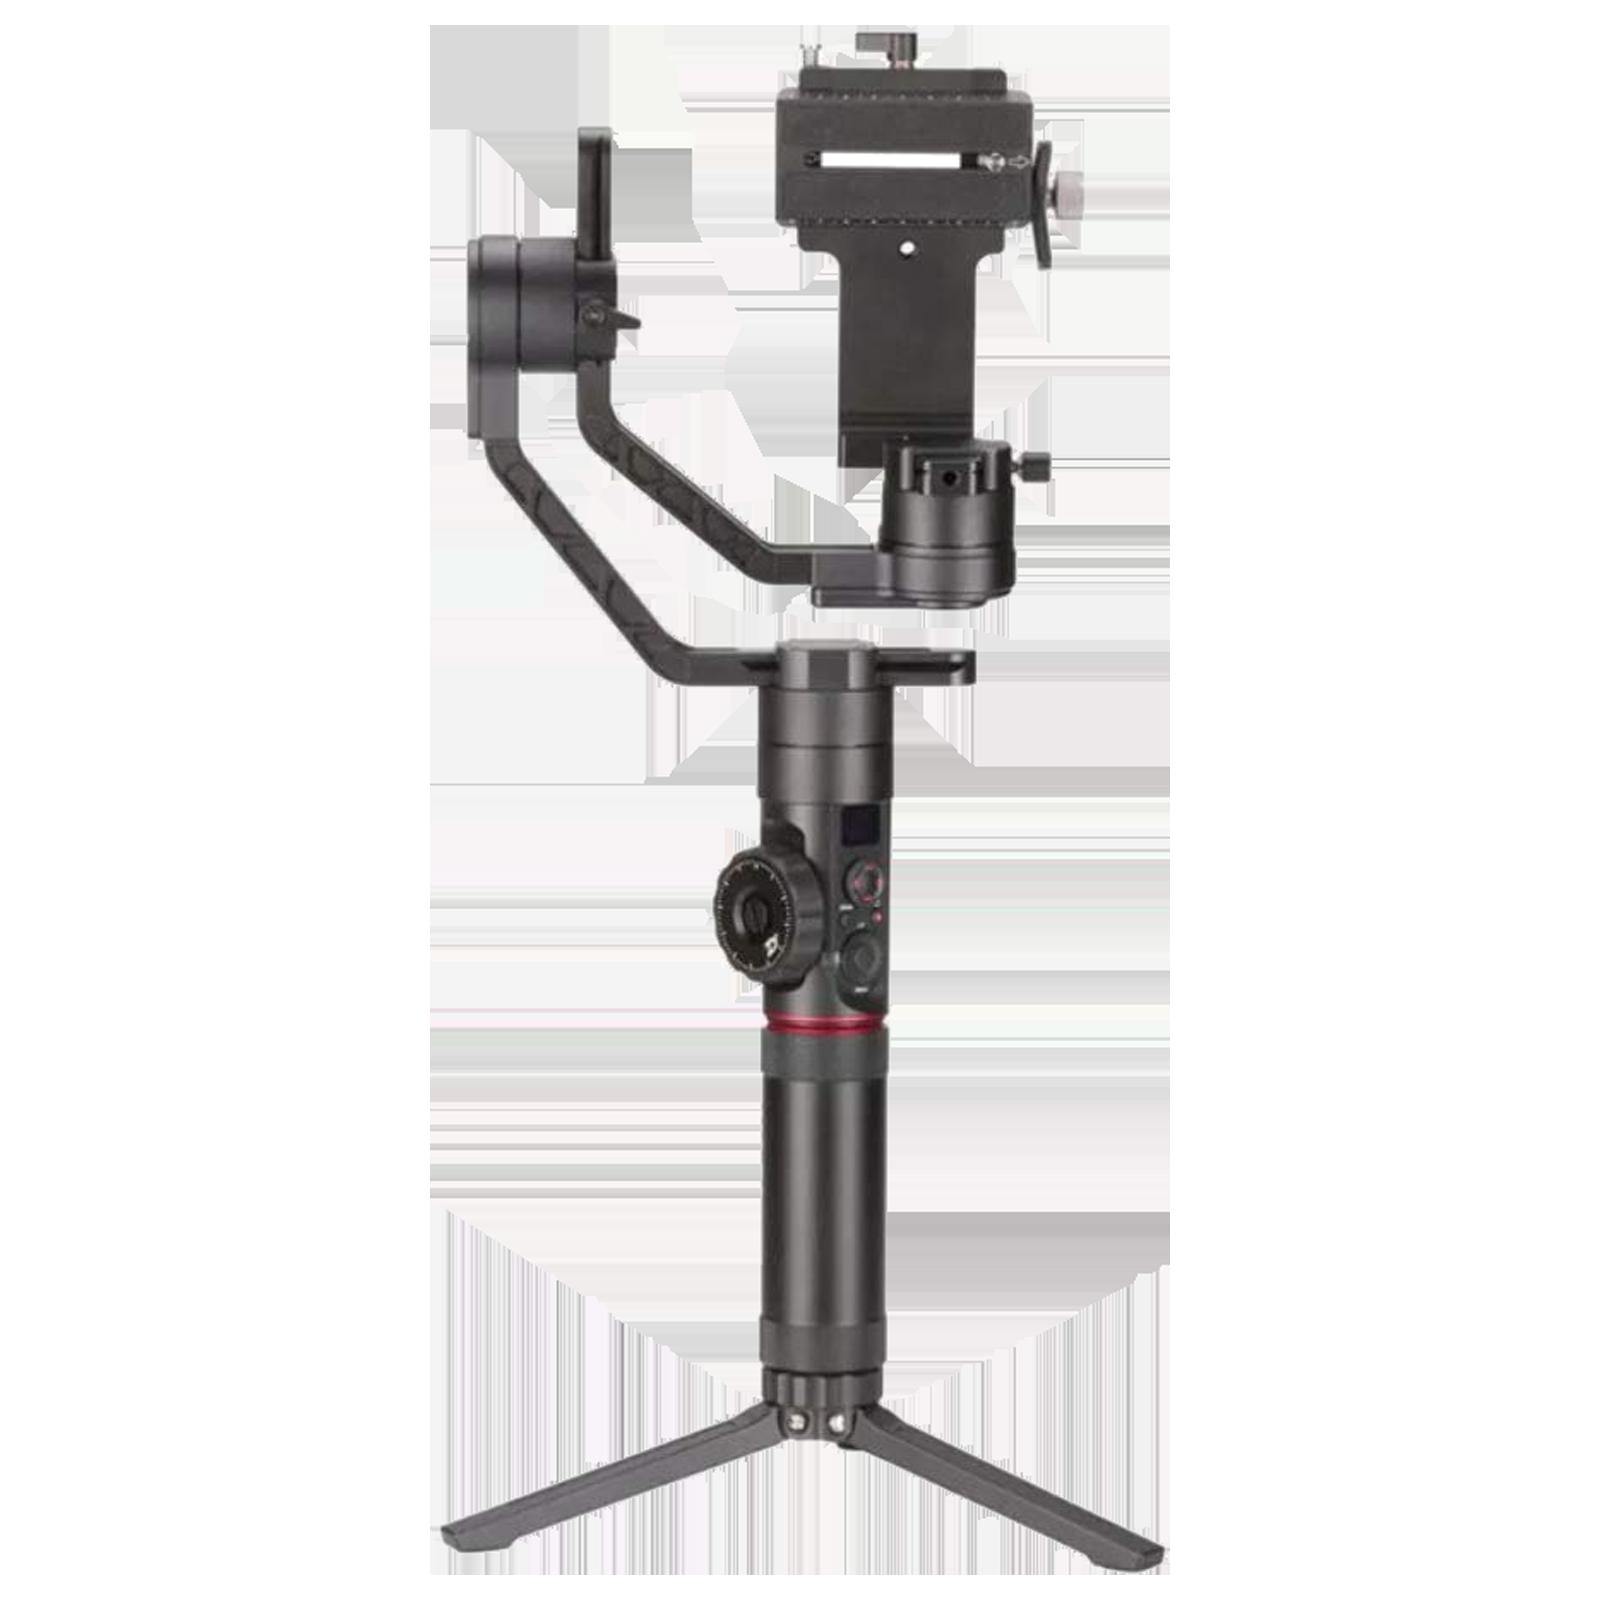 Zhiyun Crane 2 Gimbal ForDSLR Camera and Mirrorless Camera (Real Time Follow Focus, ZH.00000007.01, Black)_1